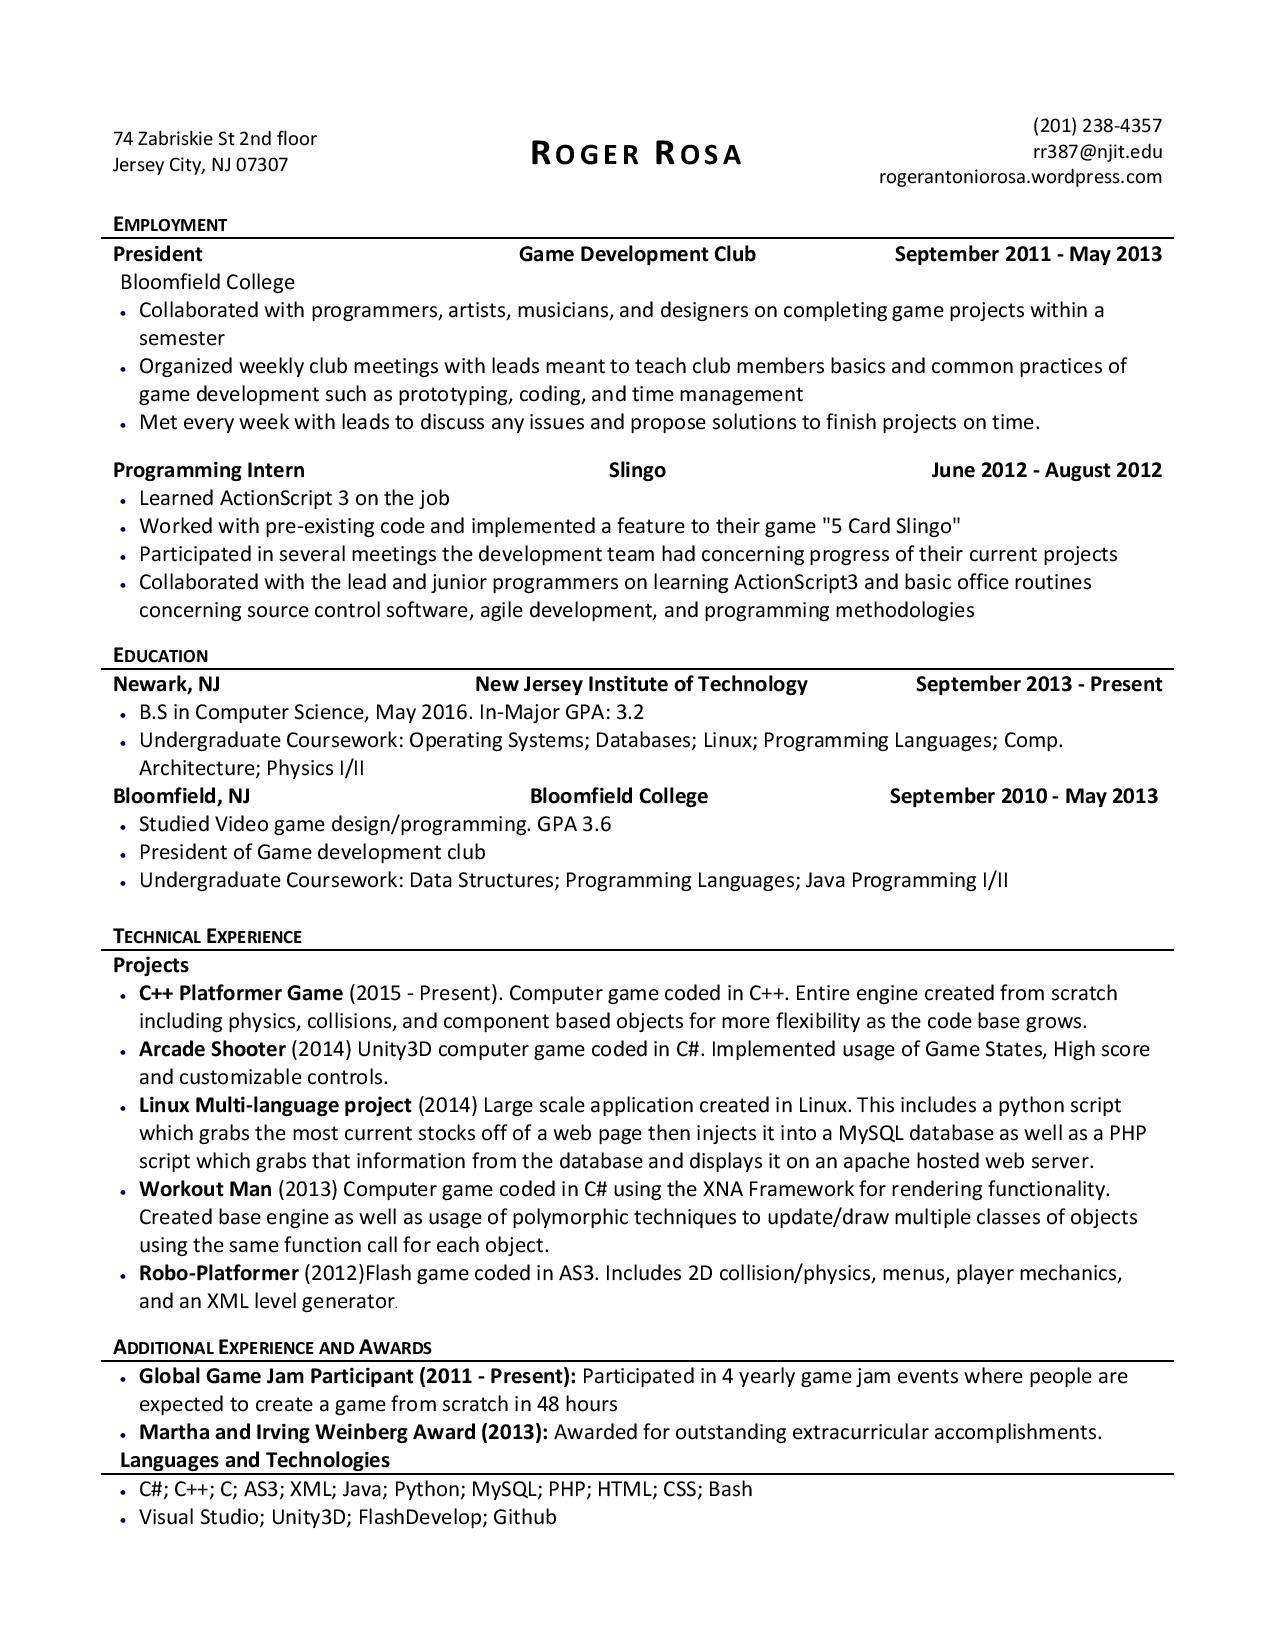 Premium essay writing service definition